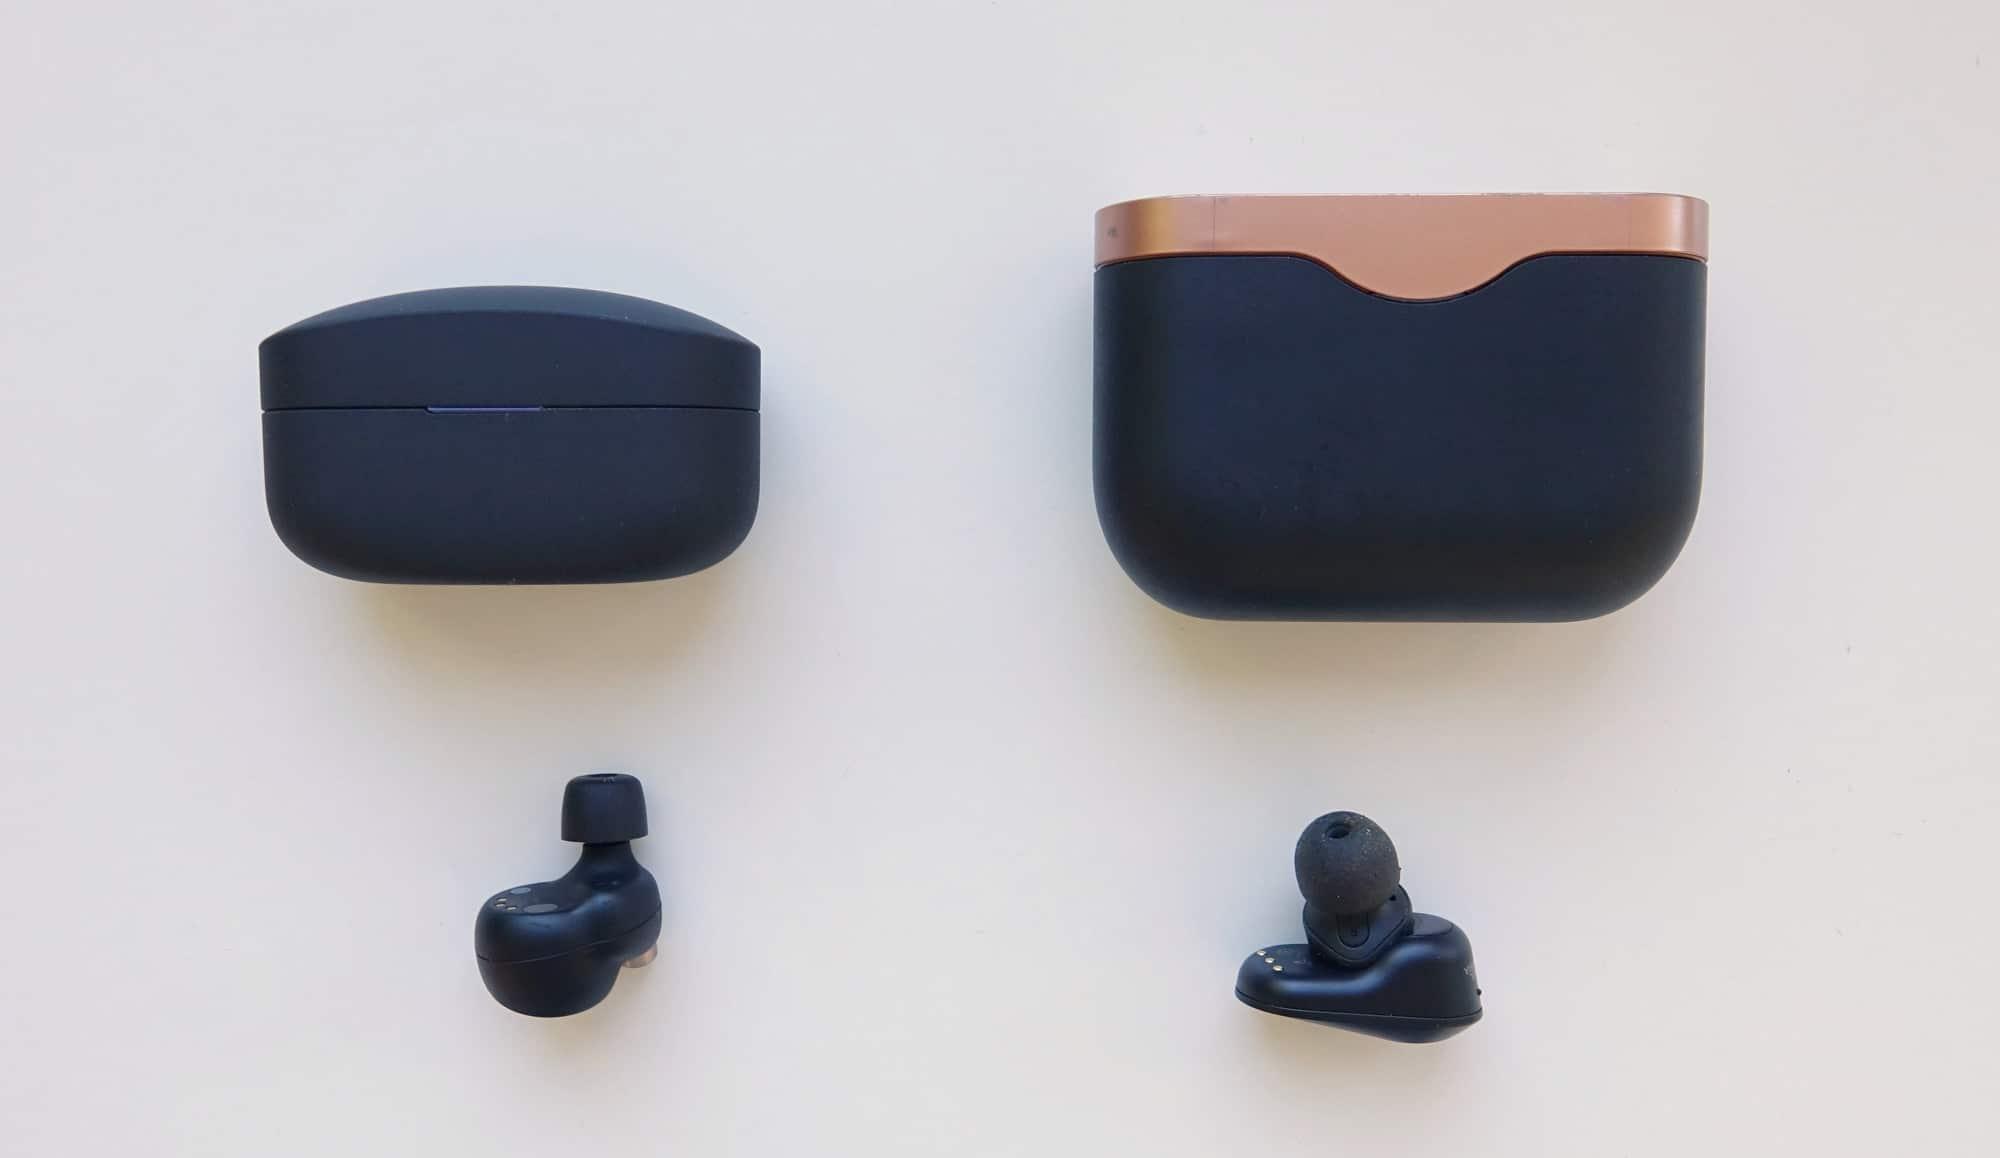 Sony WF-1000XM4 (left) vs Sony WF-1000XM3 (right)